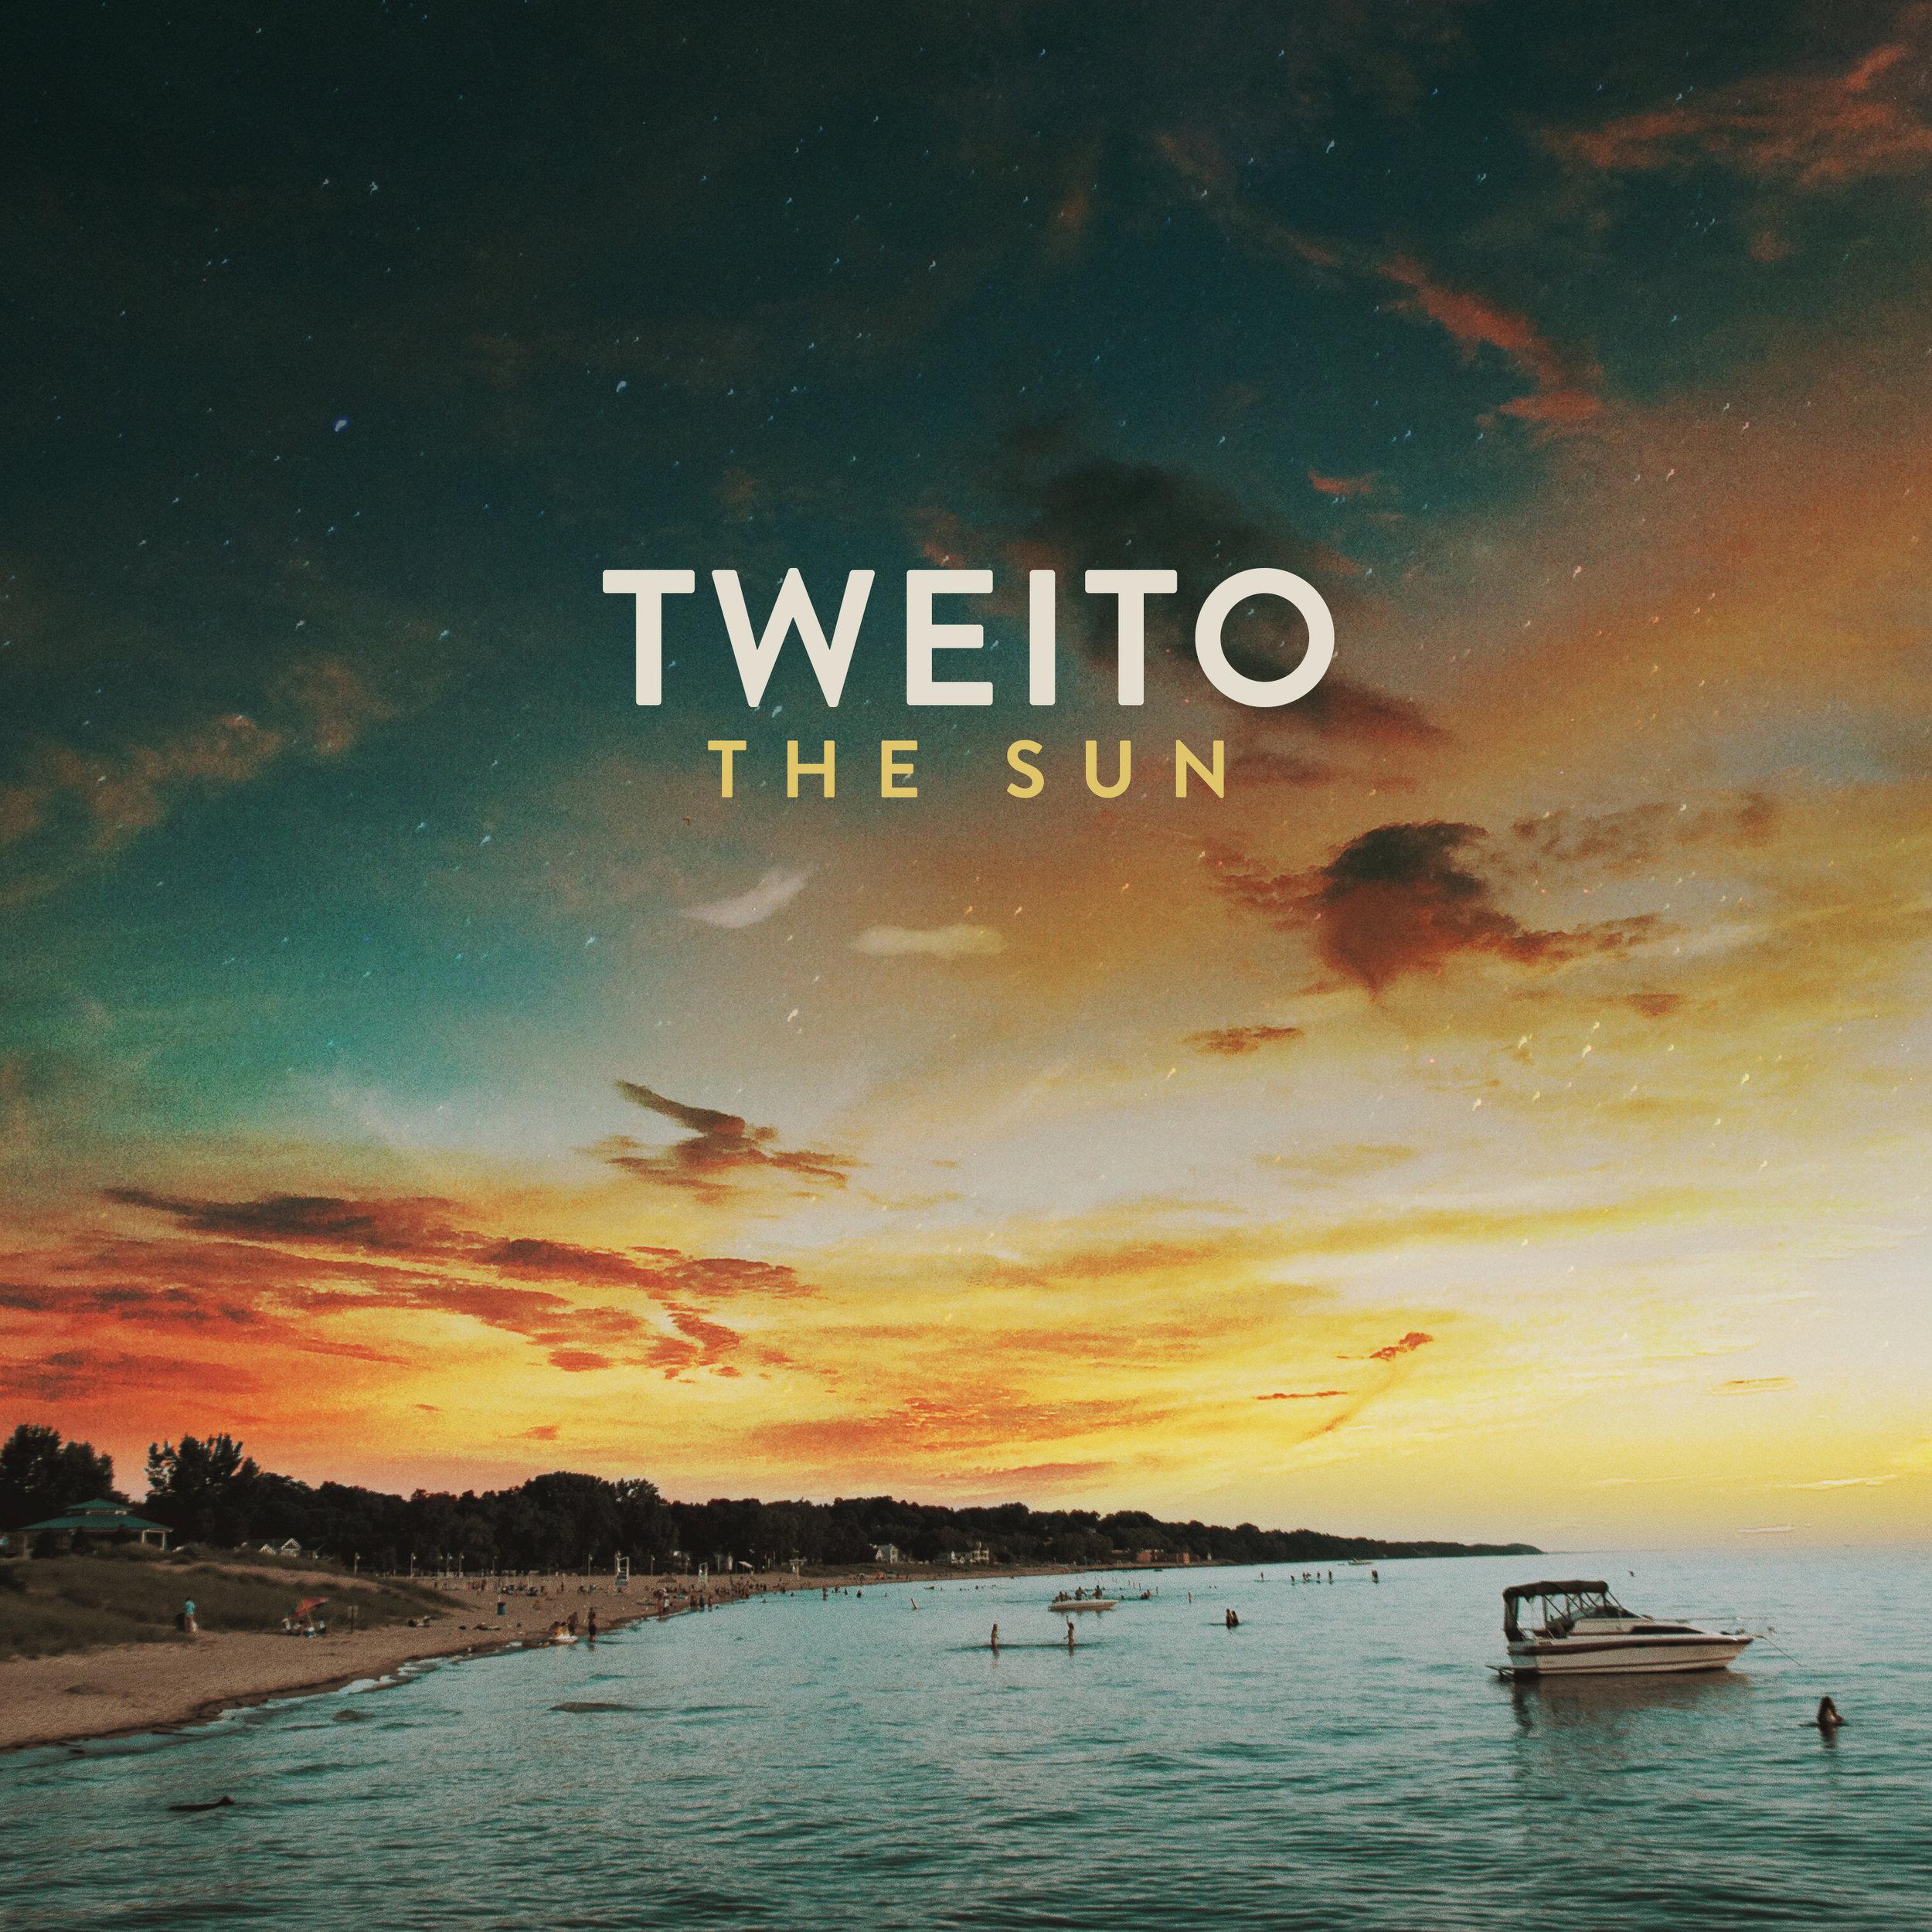 Tweito: The Sun